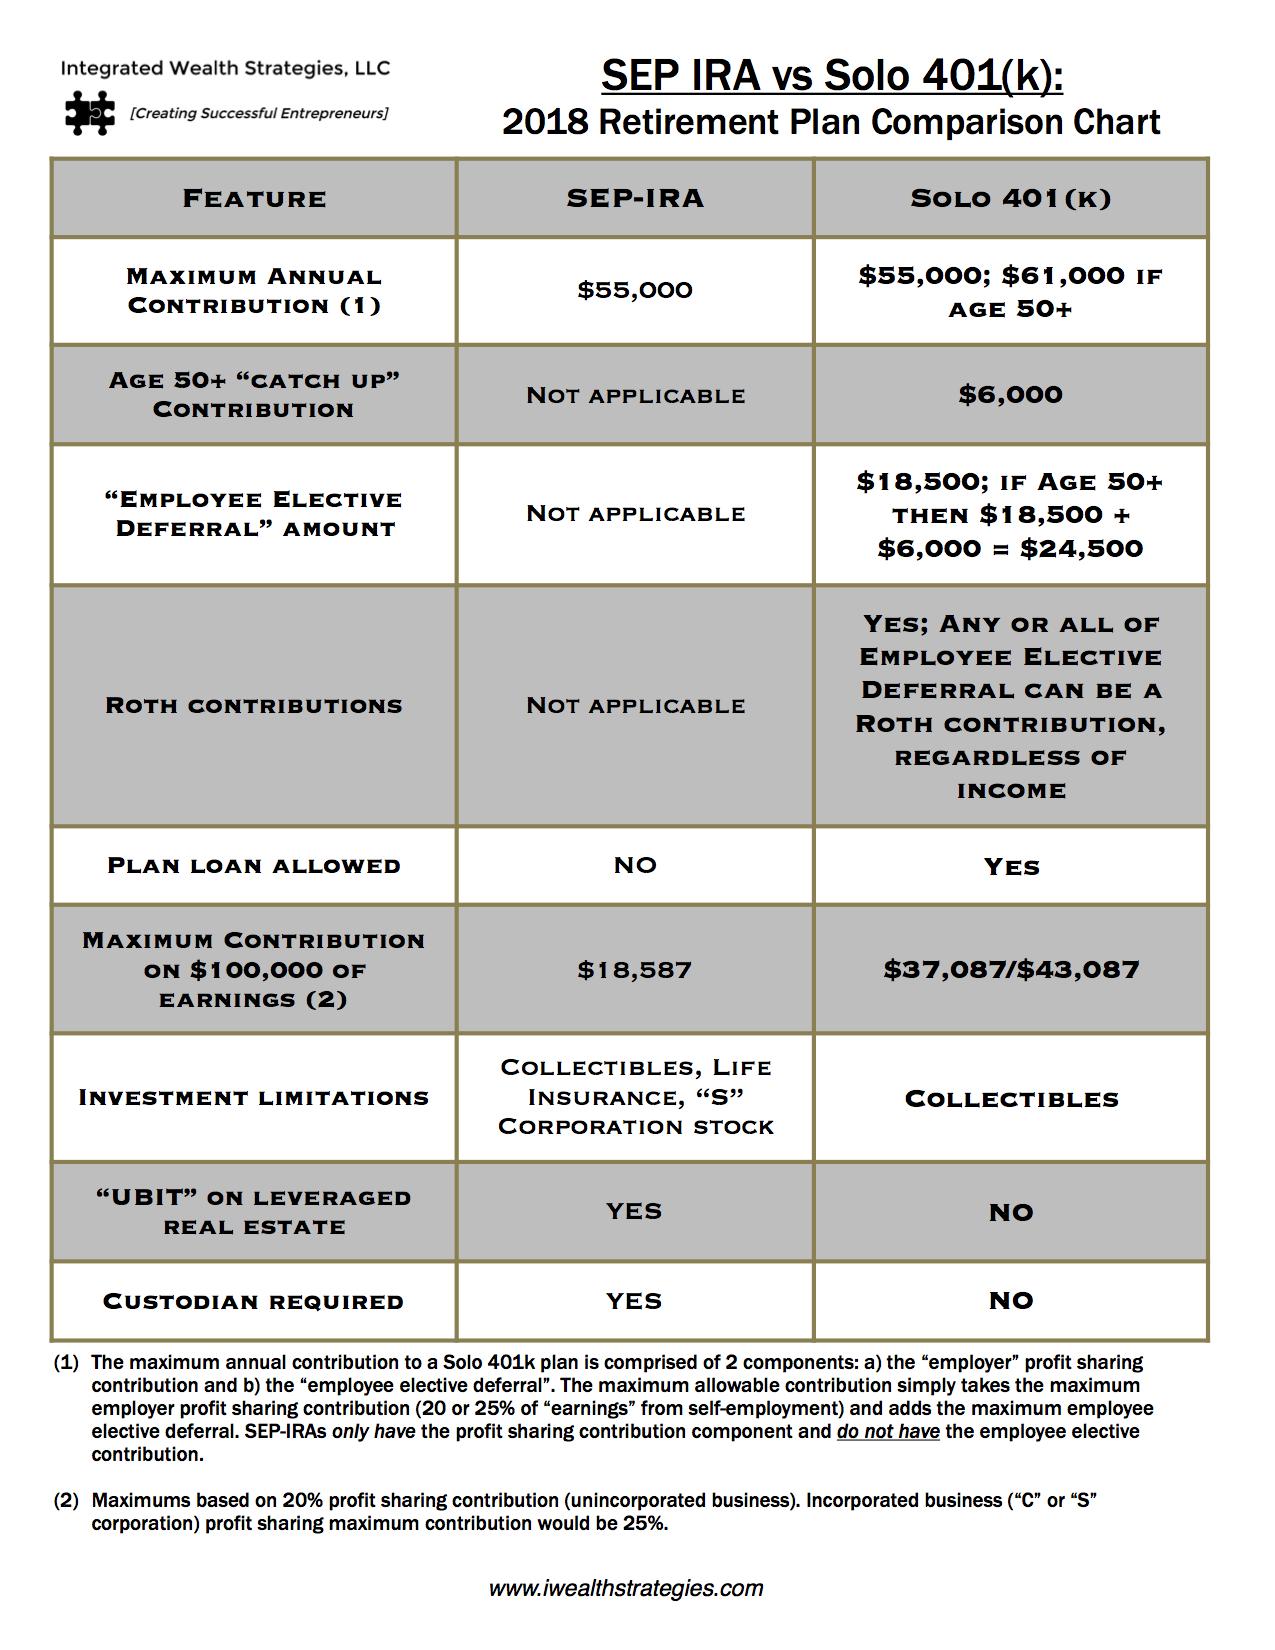 Iws 2018 Sep Vs Solo 401k Retirement Plan Comparison Chart Square E V1 Png